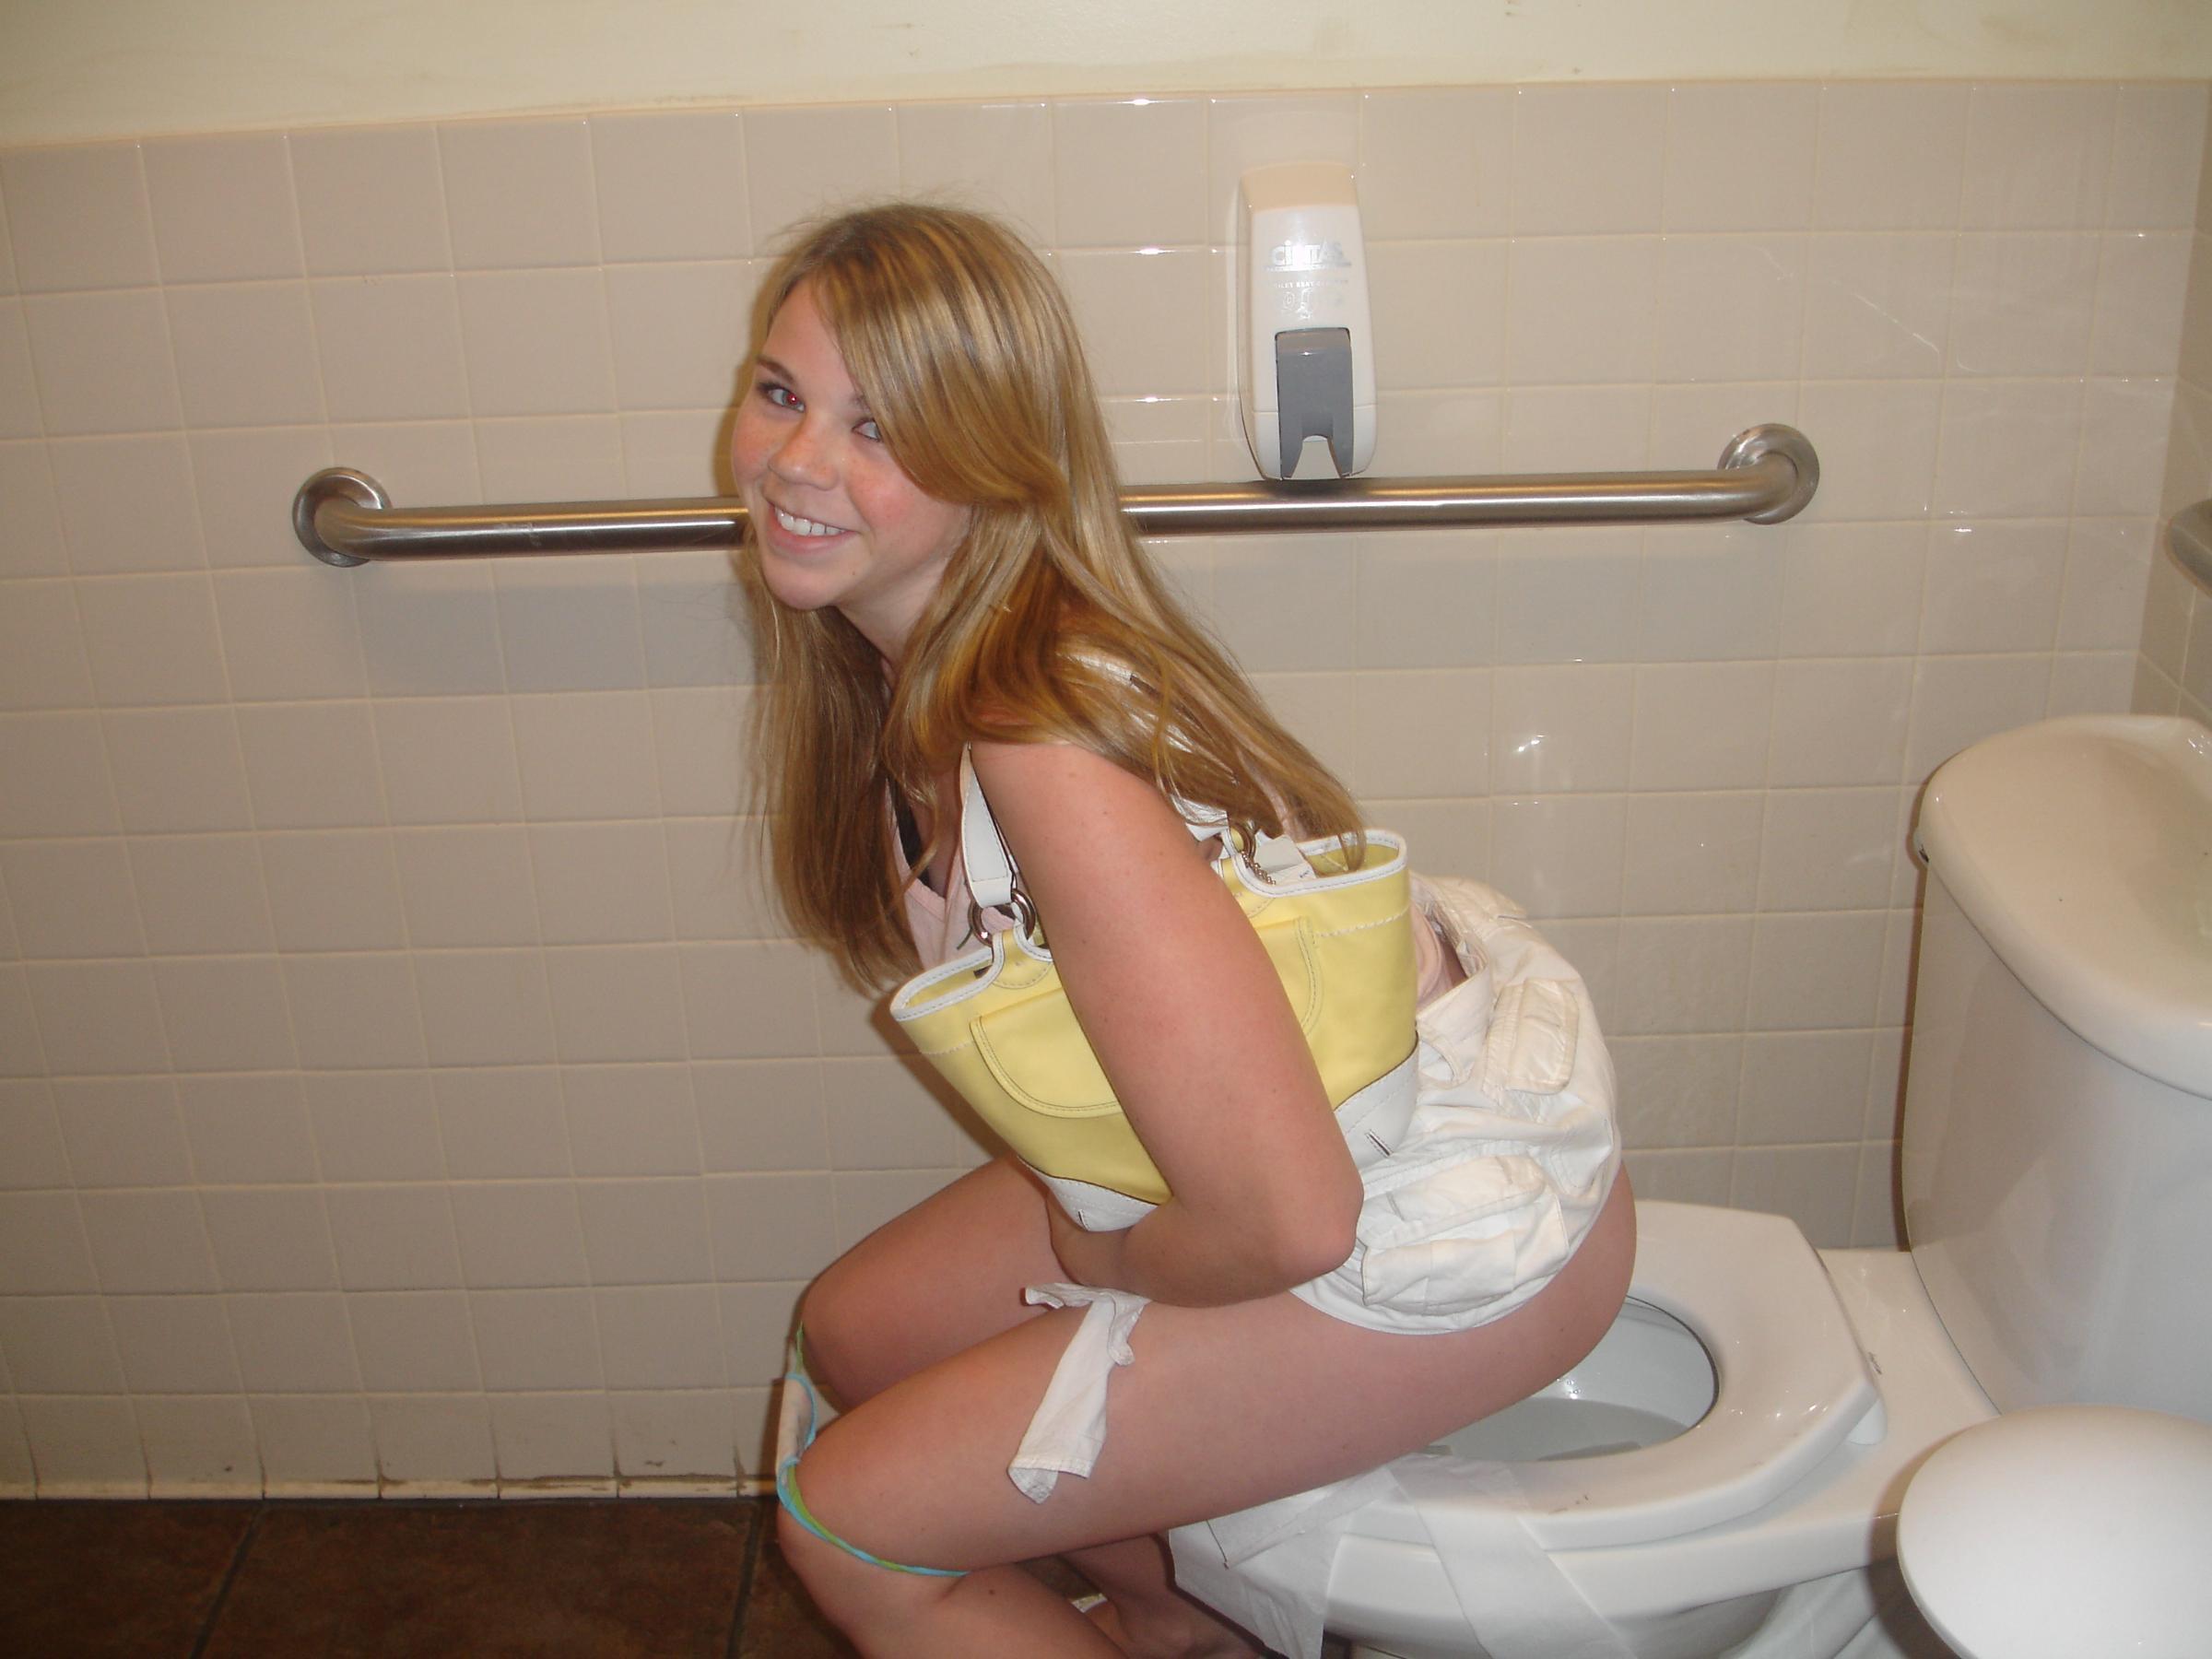 Girls in toilette pissing teen